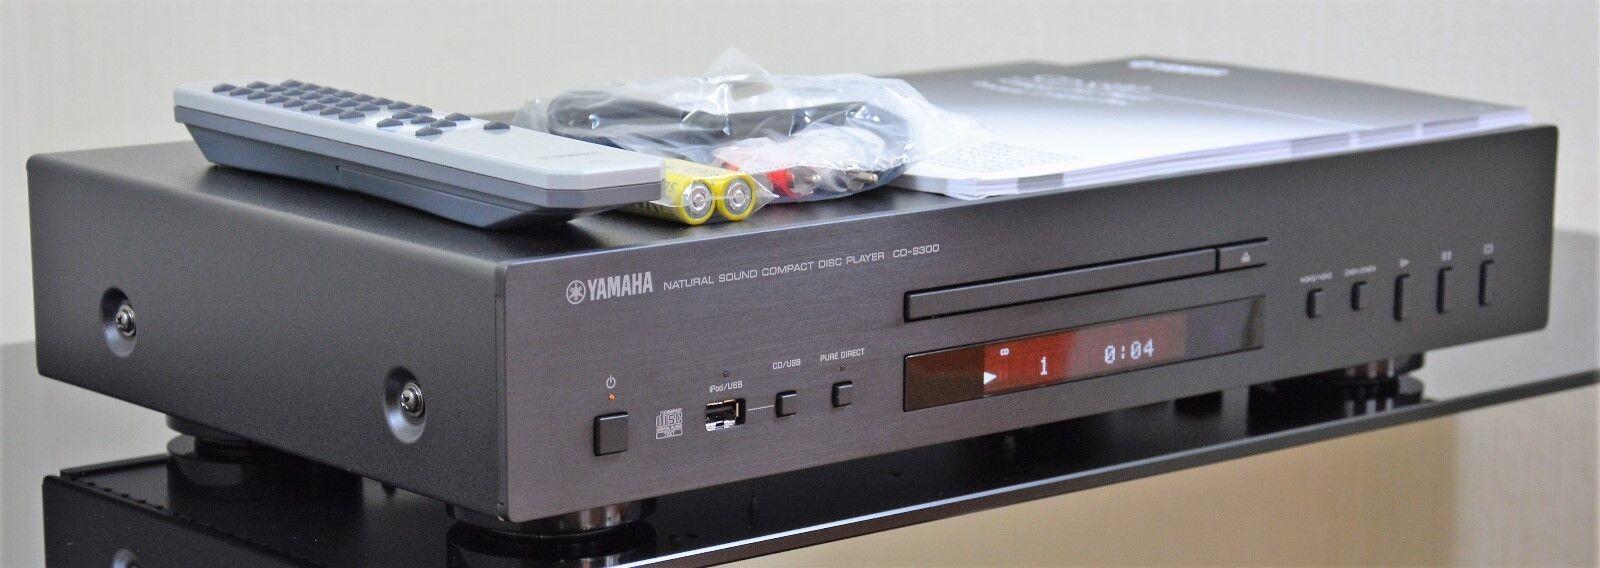 #1019 Yamaha CD-S300 CD-Player mit 1 Jahr Gewährleistung